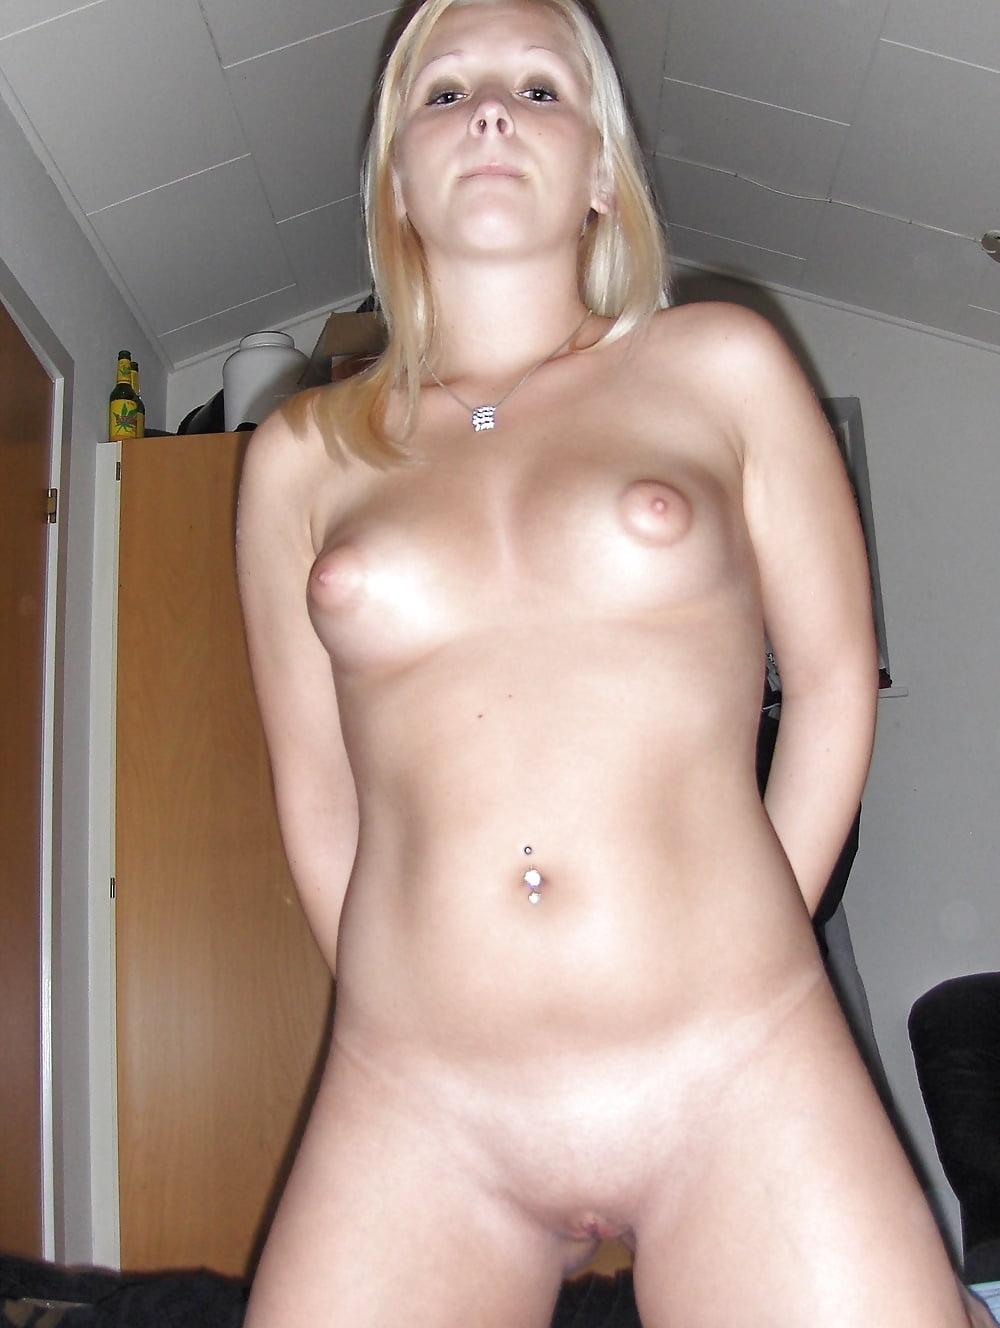 Zishy Carmen Rae Shaven Amateur Porniki Sex Hd Pics